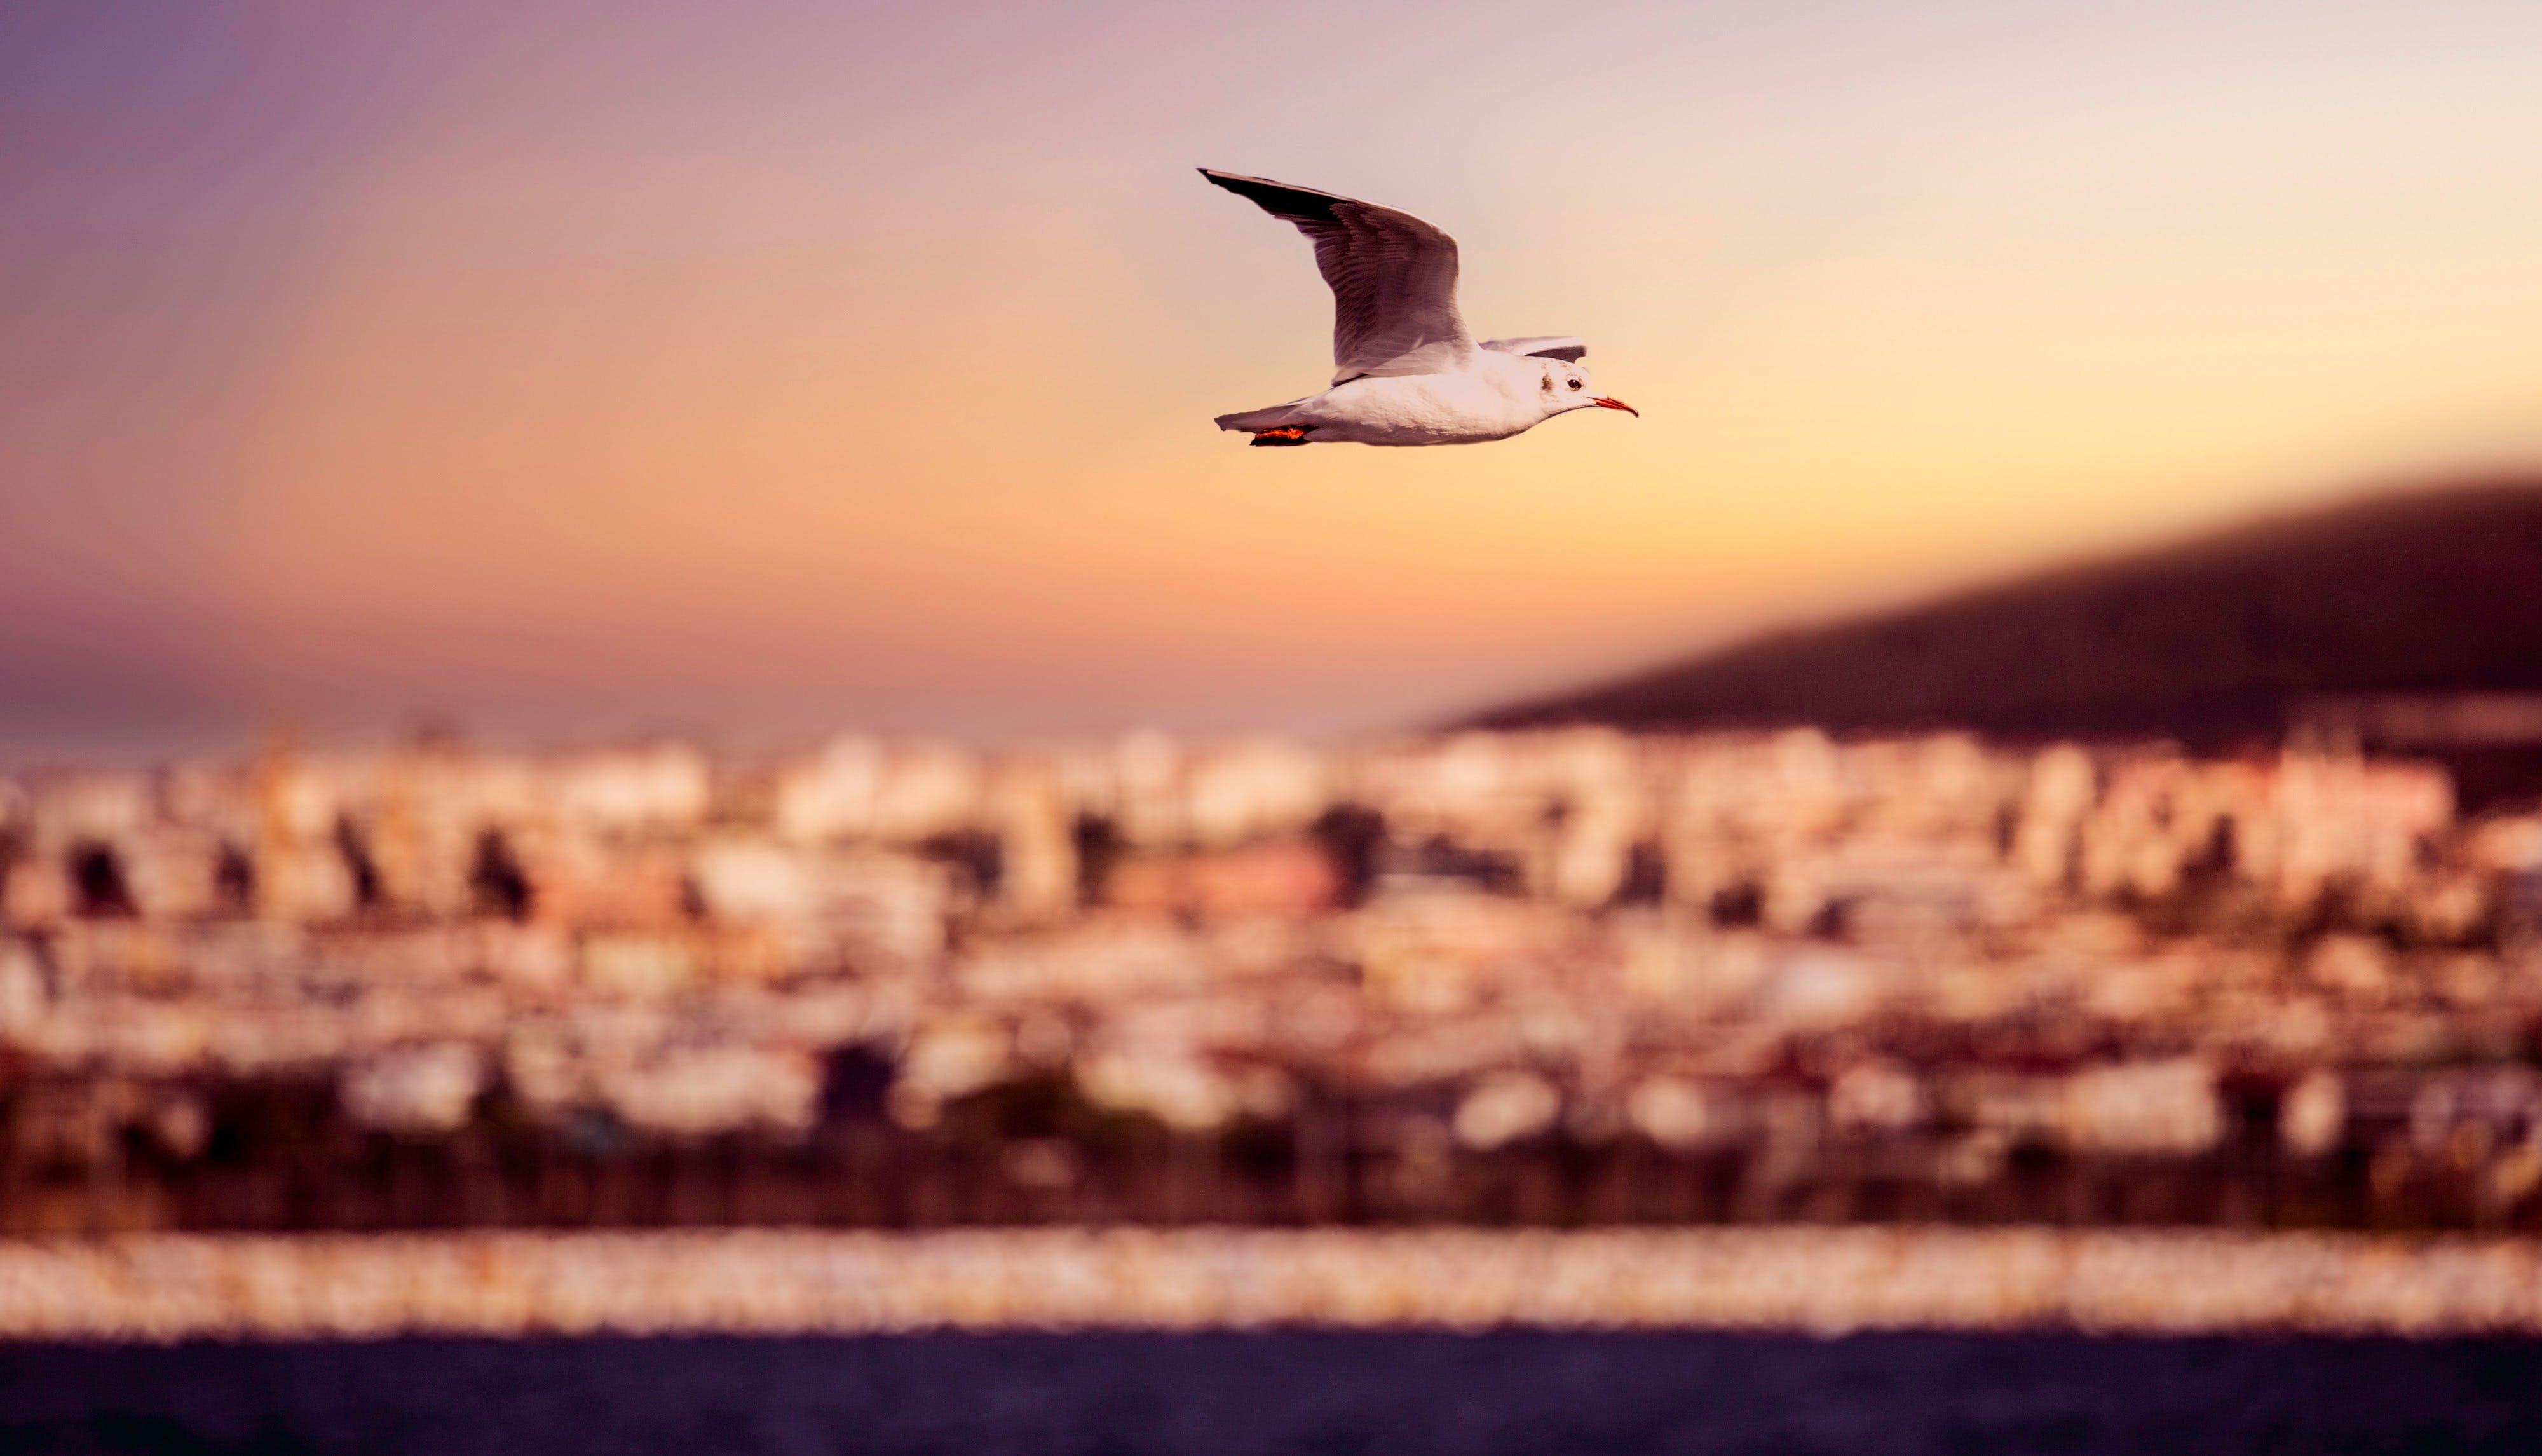 Free stock photo of sea, city, sky, bird